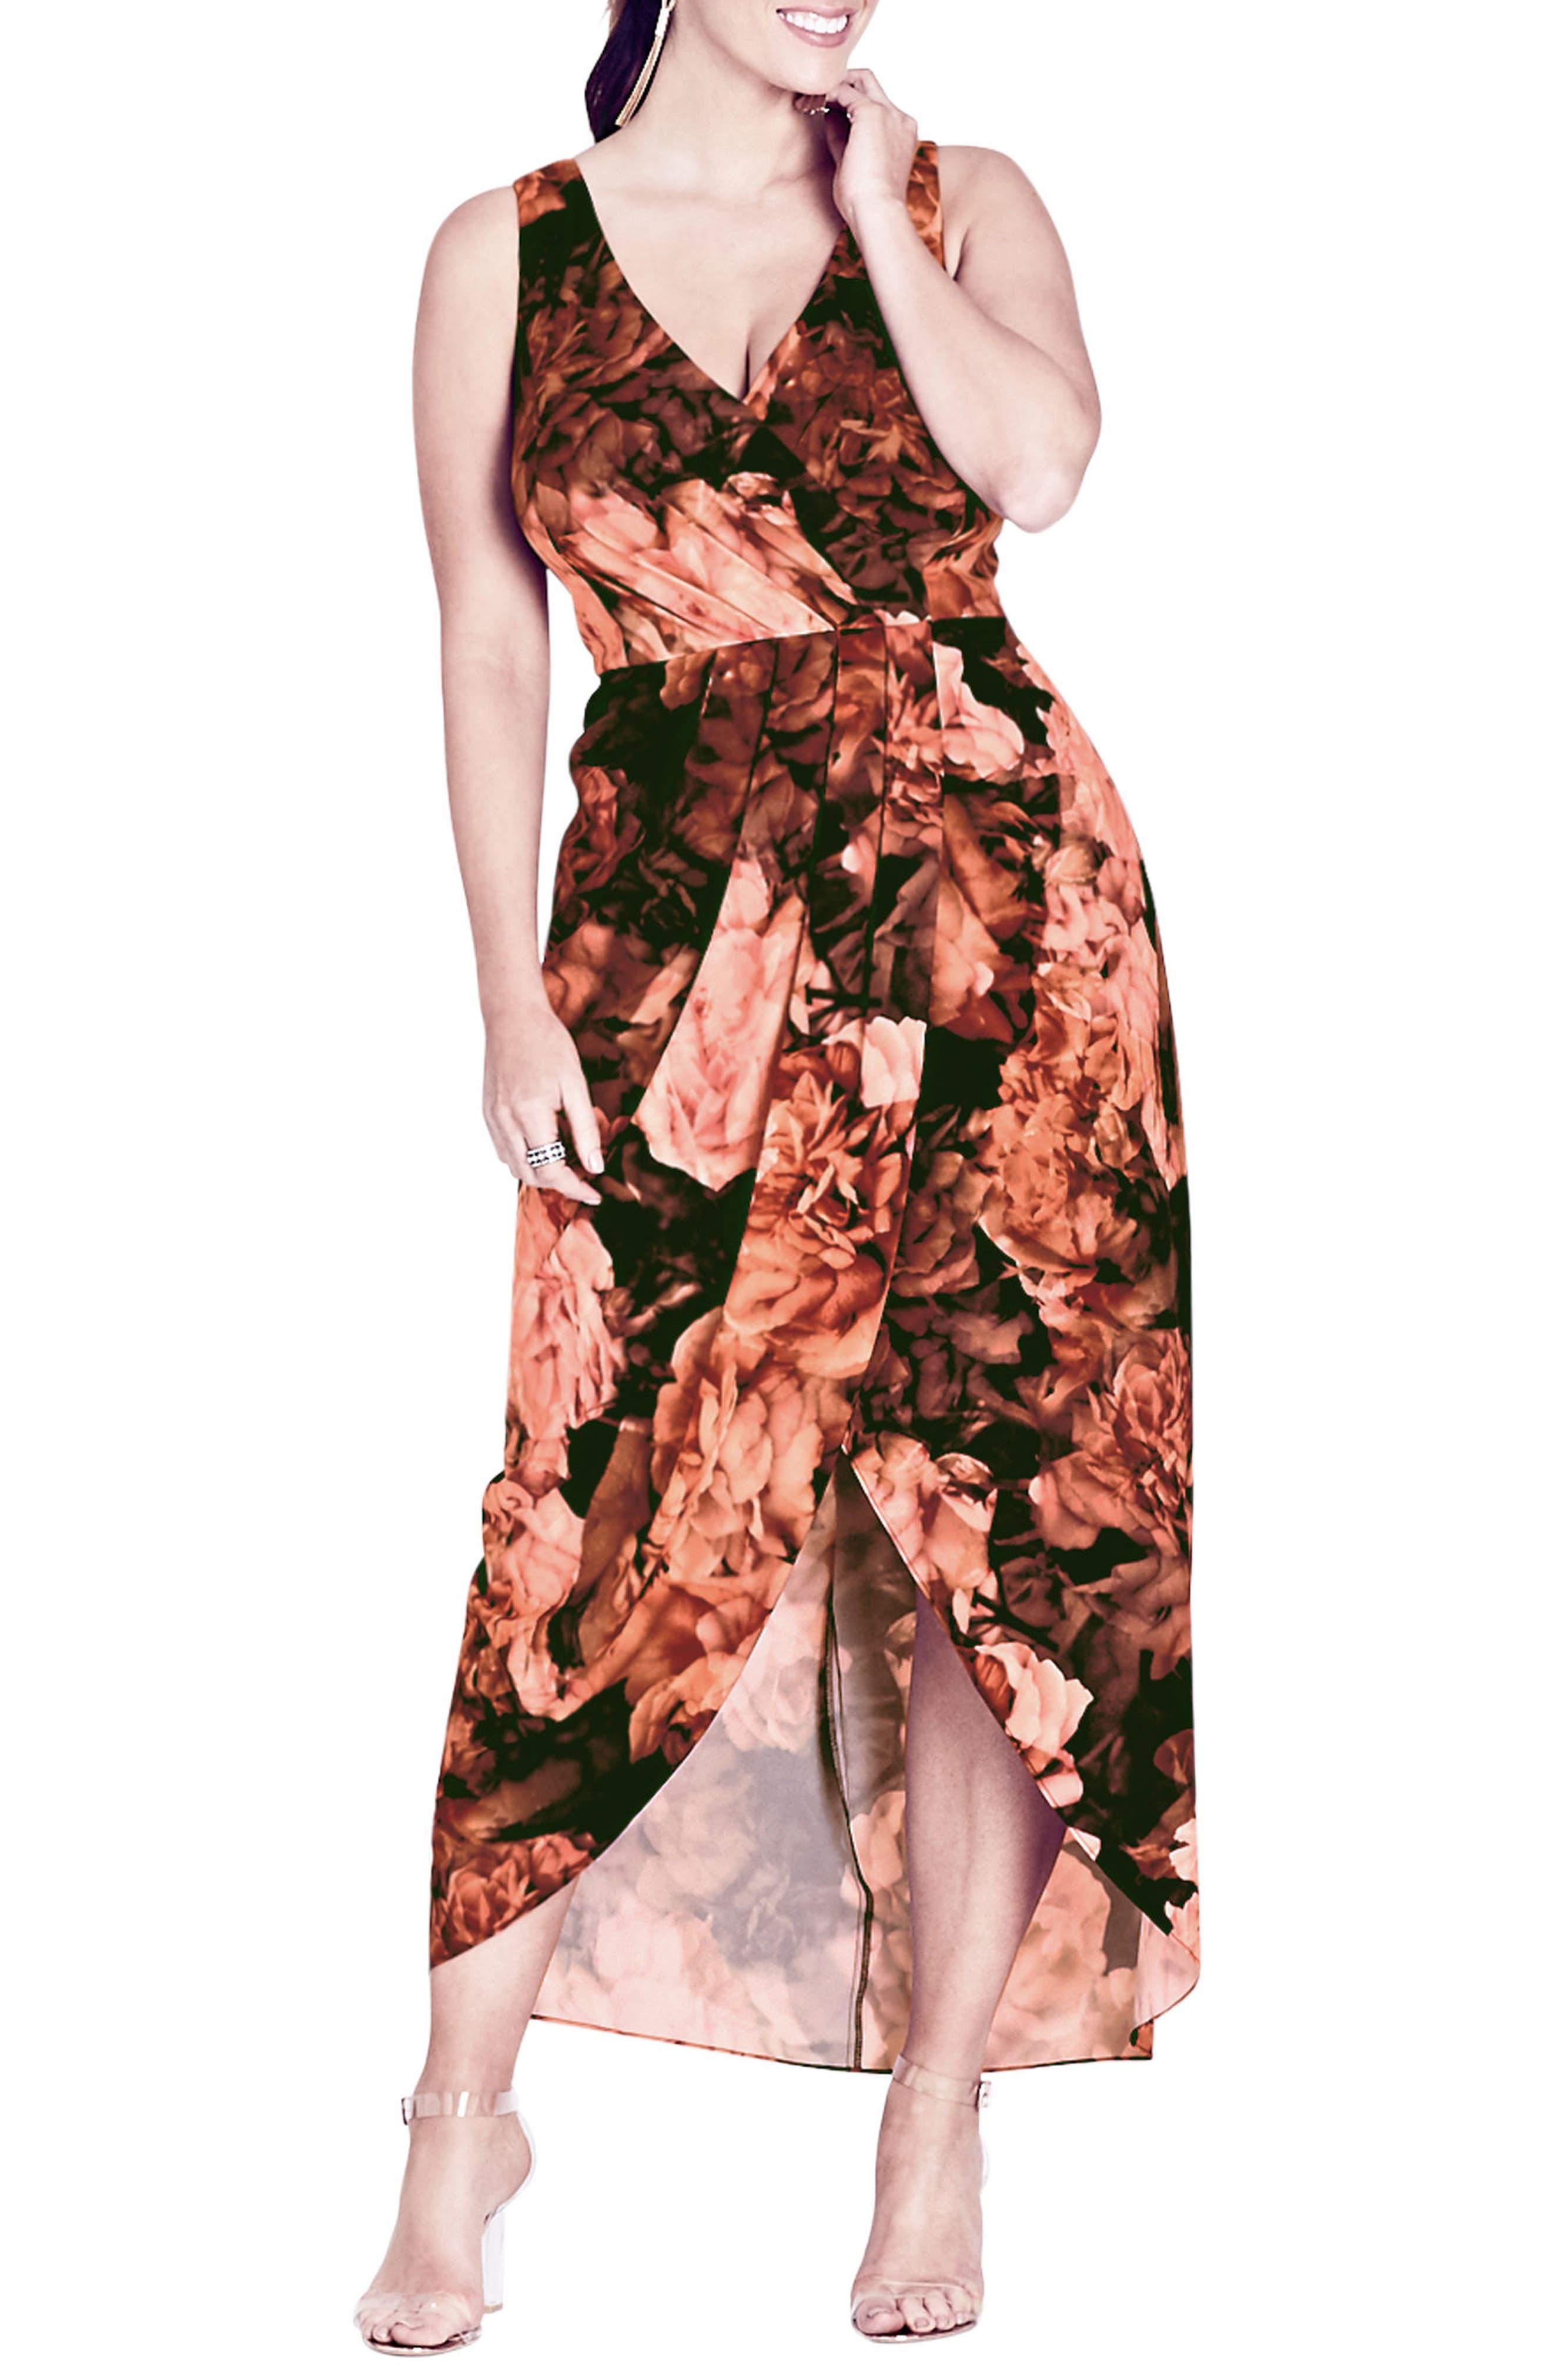 Alternate Image 1 Selected - City Chic Soft Autumn Maxi Dress (Plus Size)